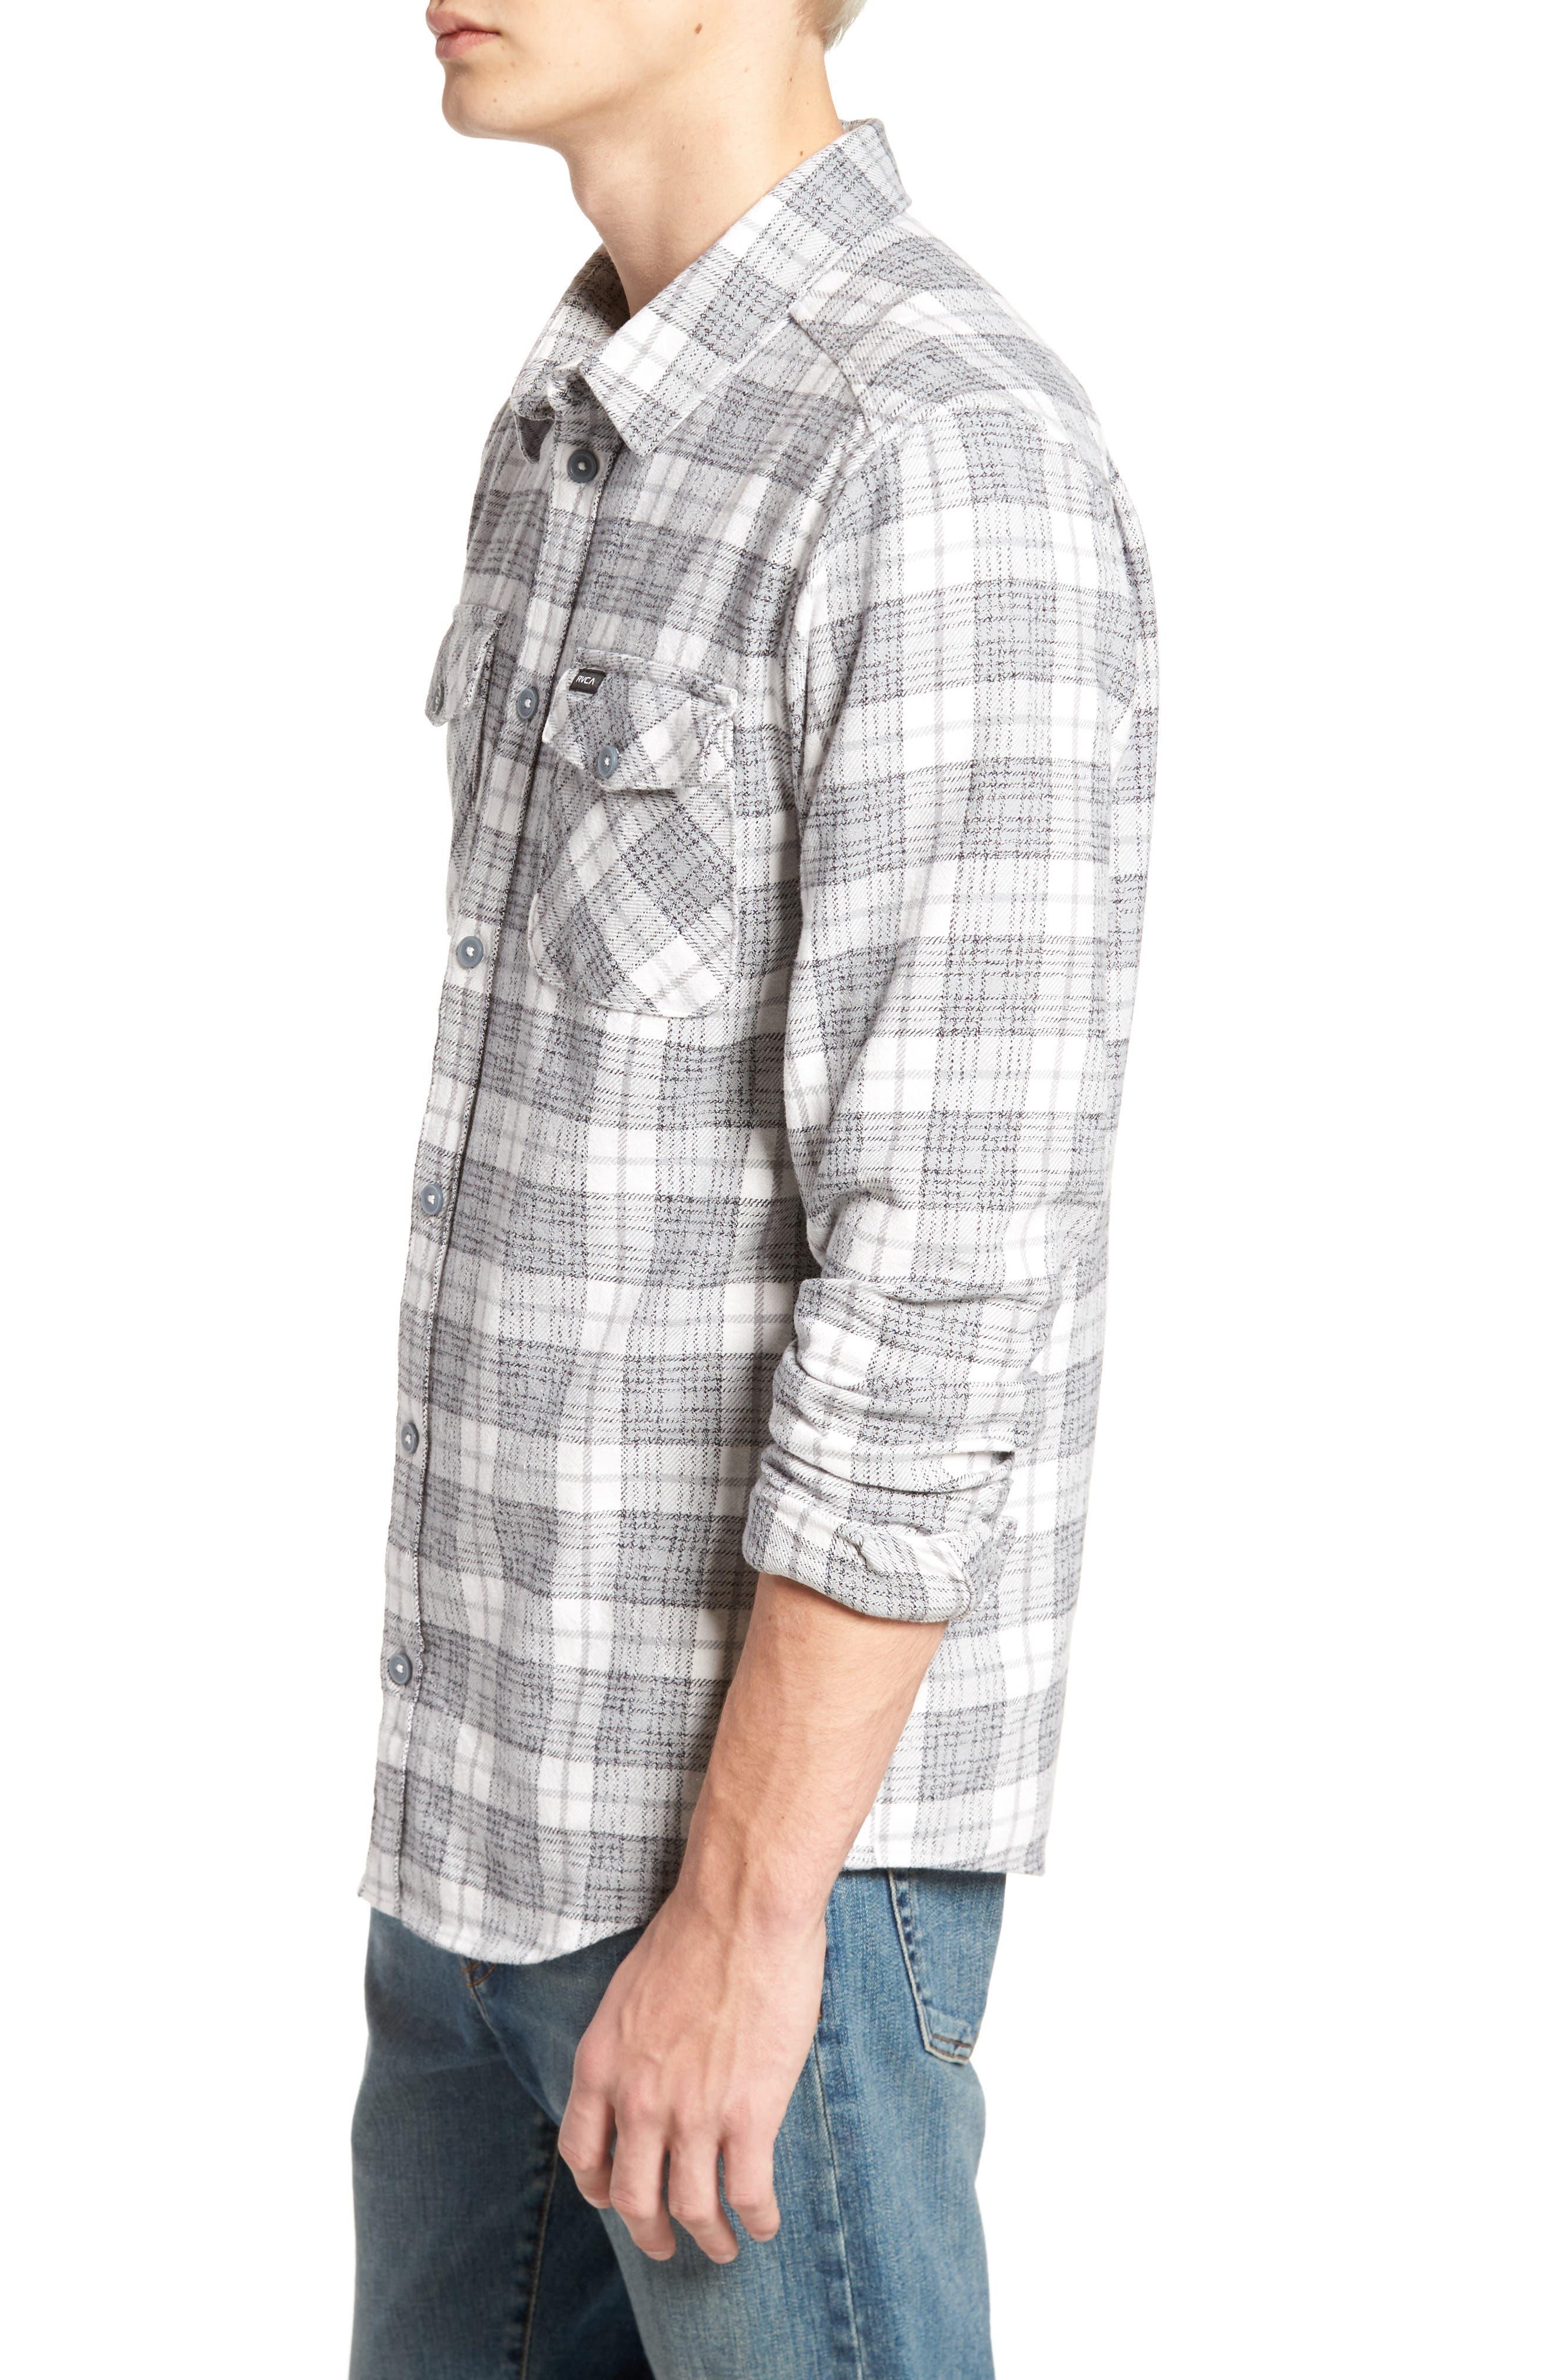 'That'll Work' Trim Fit Plaid Flannel Shirt,                             Alternate thumbnail 3, color,                             ANTIQUE WHITE